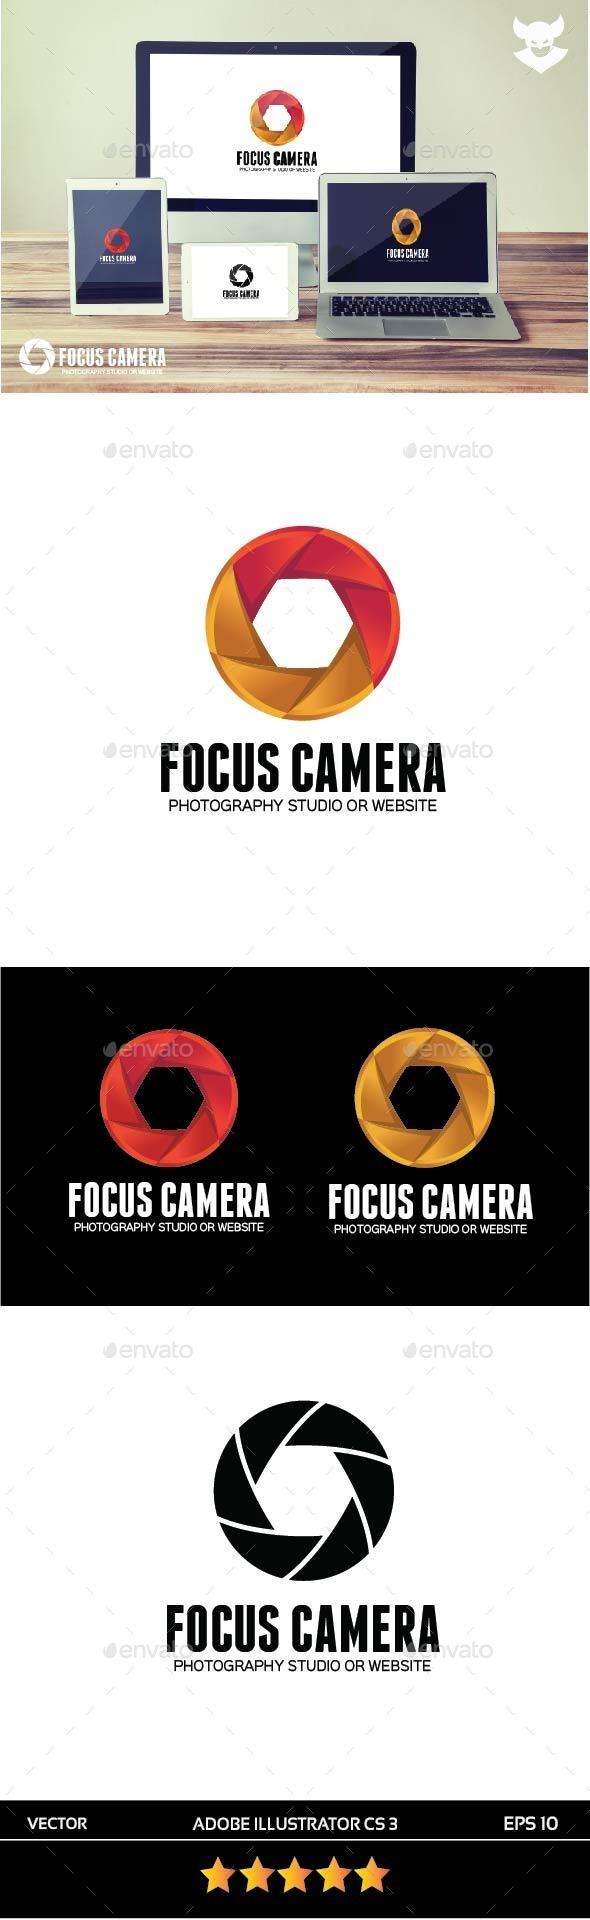 Focus Camera Logo - Objects Logo Templates